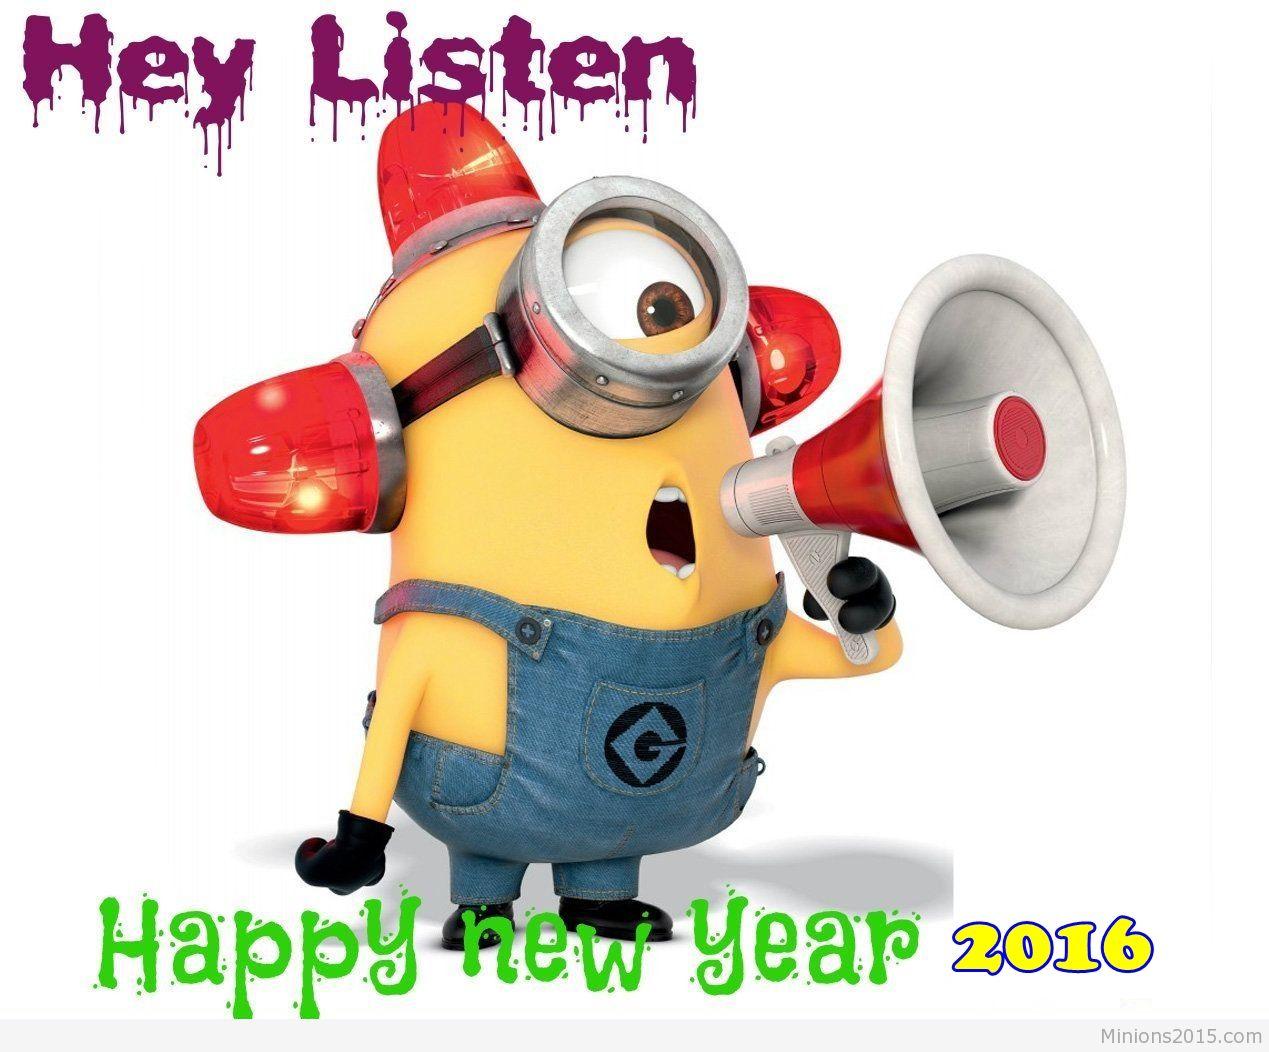 GAMBAR UCAPAN TAHUN BARU LUCU 2016 DP Kartun Selamat Tahun Baru